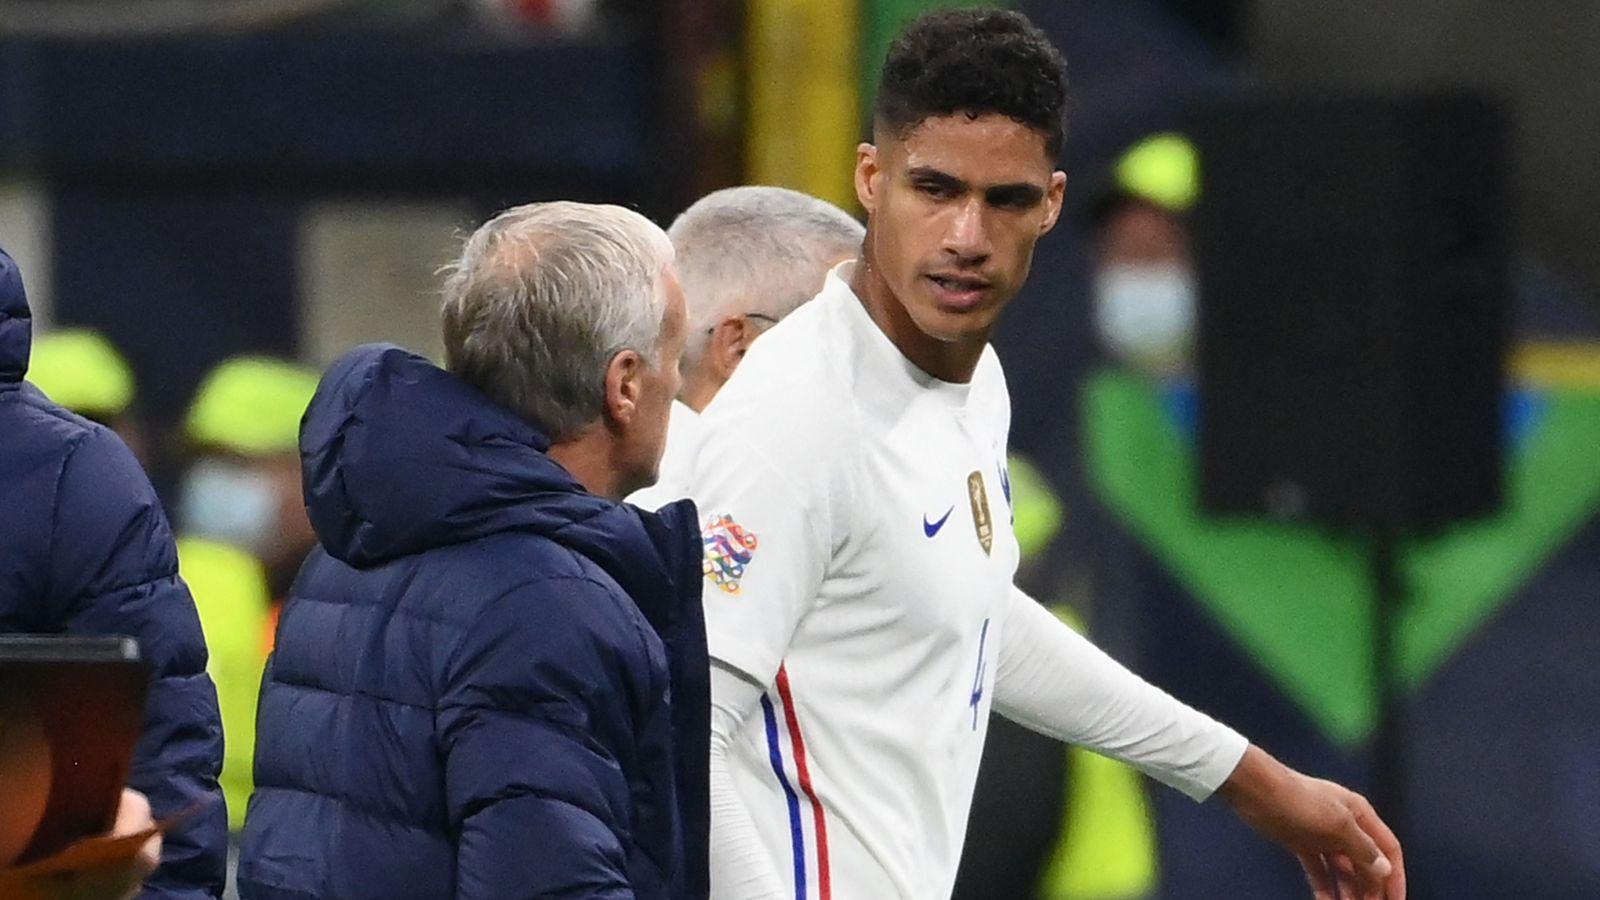 Raphael Varane injury: Man Utd defender hobbles out of UEFA Nations League final between France and Spain | Football News | Sky Sports